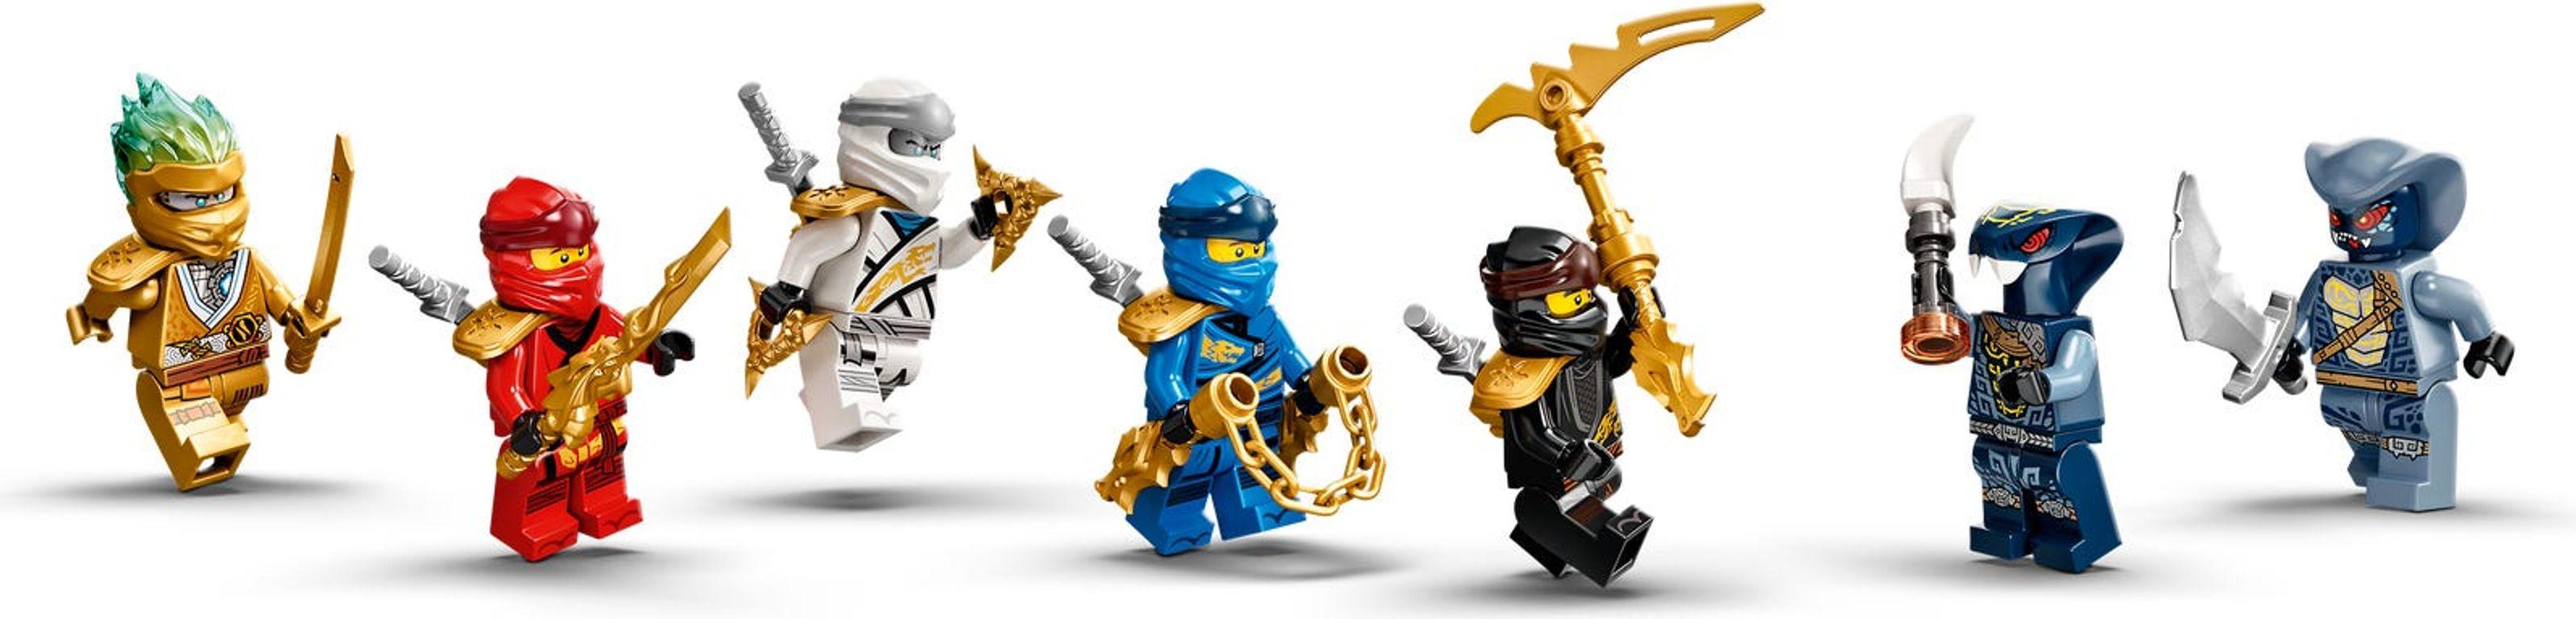 LEGO® Ninjago Ultra Sonic Raider minifigures